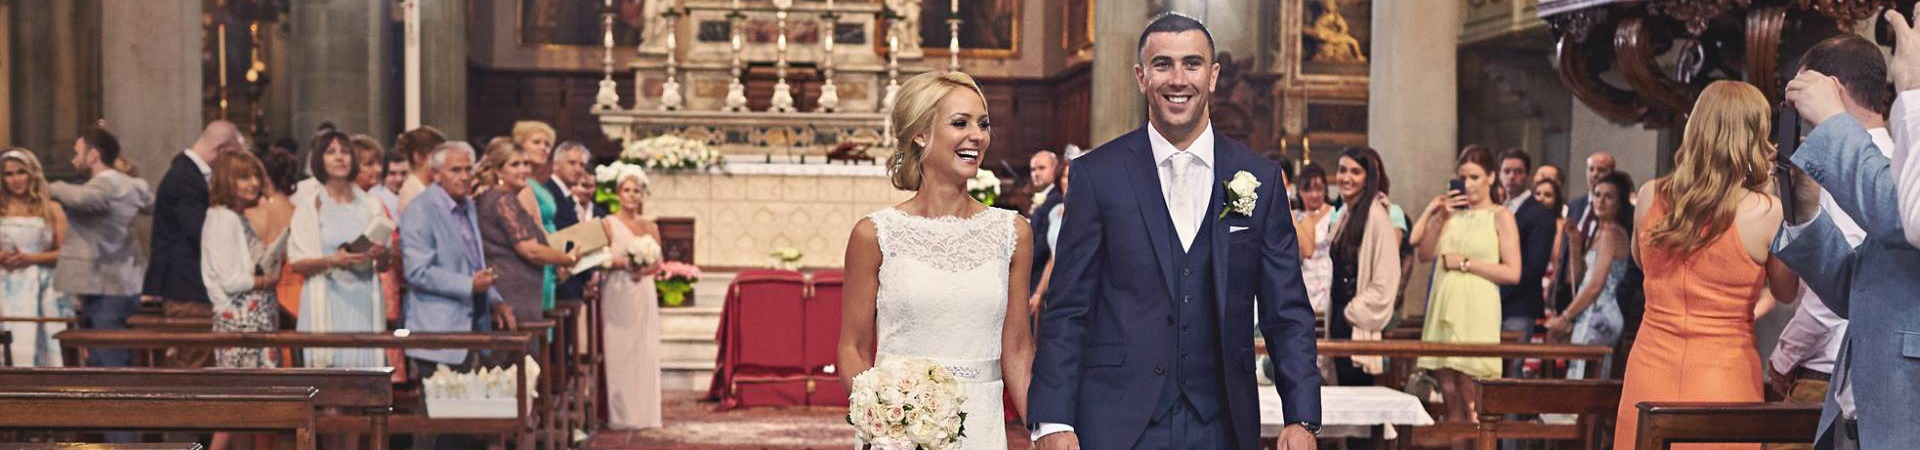 Traditional Italian Wedding Ceremonies Italian Wedding Bands